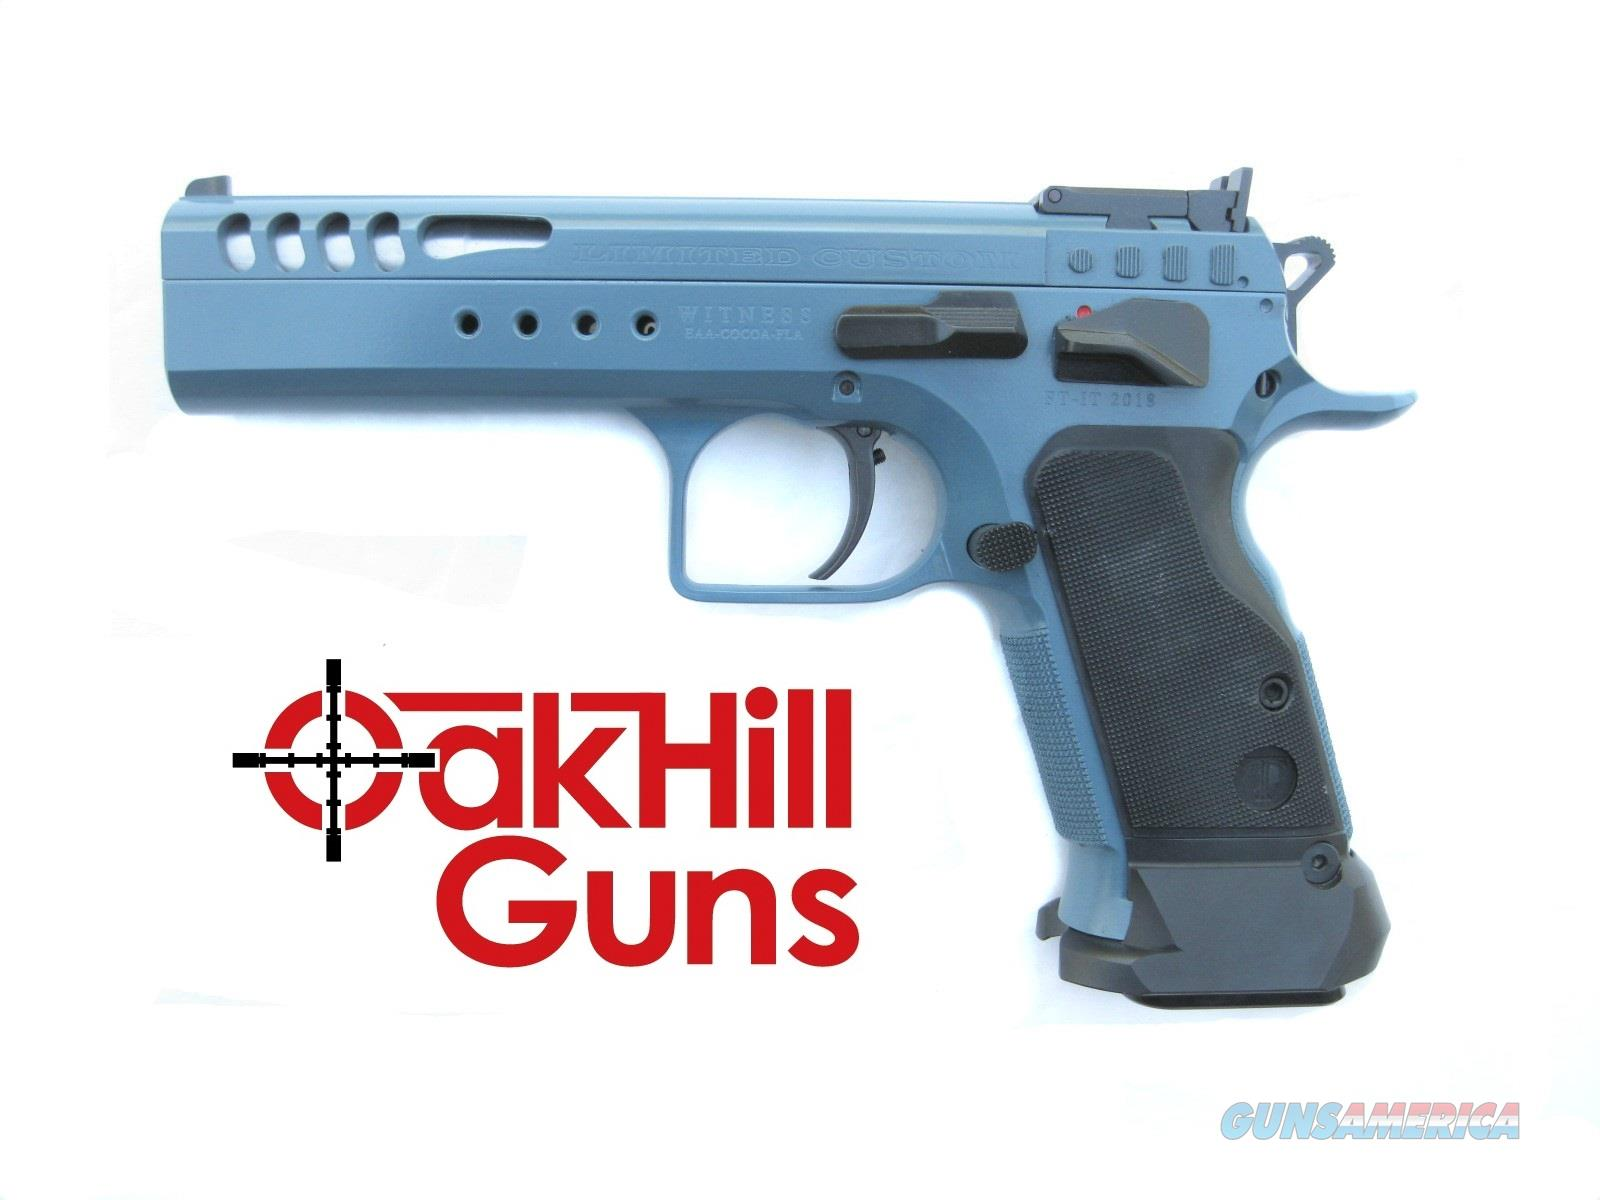 EAA Witness Limited Custom- Tanfoglio 9mm Steel Tancoat Lightened Slide 600330 *NEW*  Guns > Pistols > EAA Pistols > Other